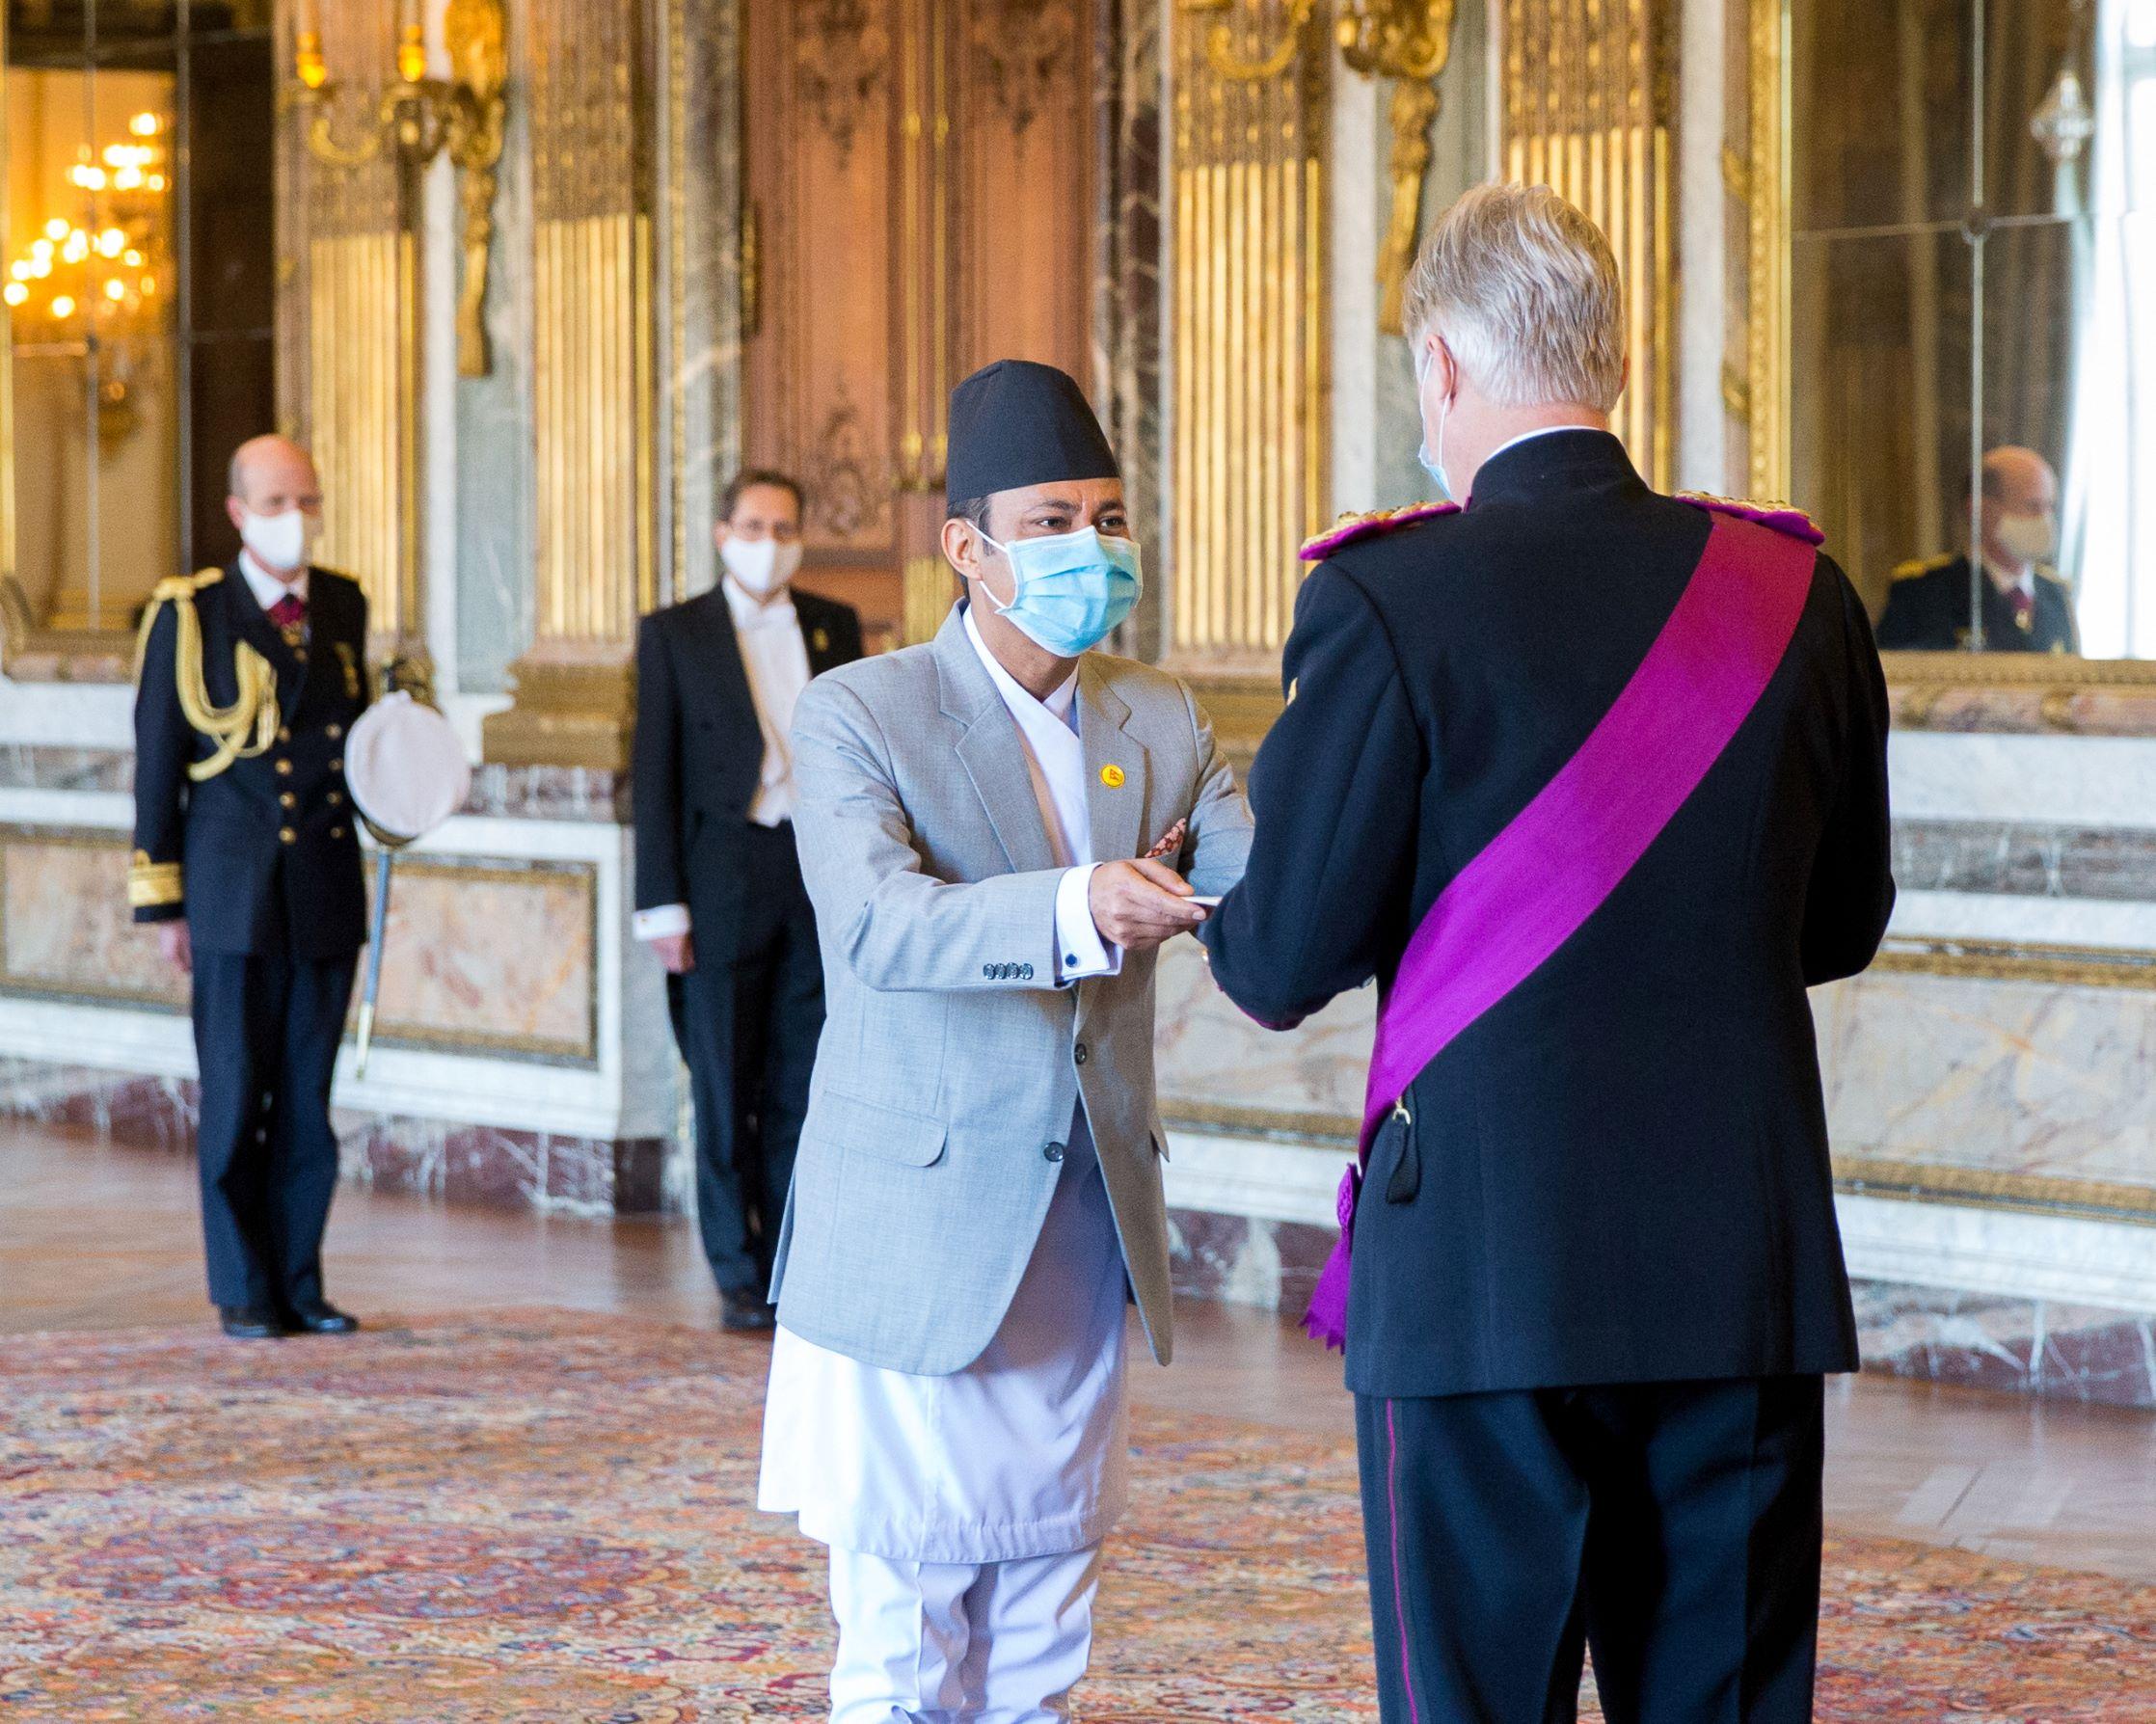 Ambassador Rajbhandari presents his credential to Belgian King